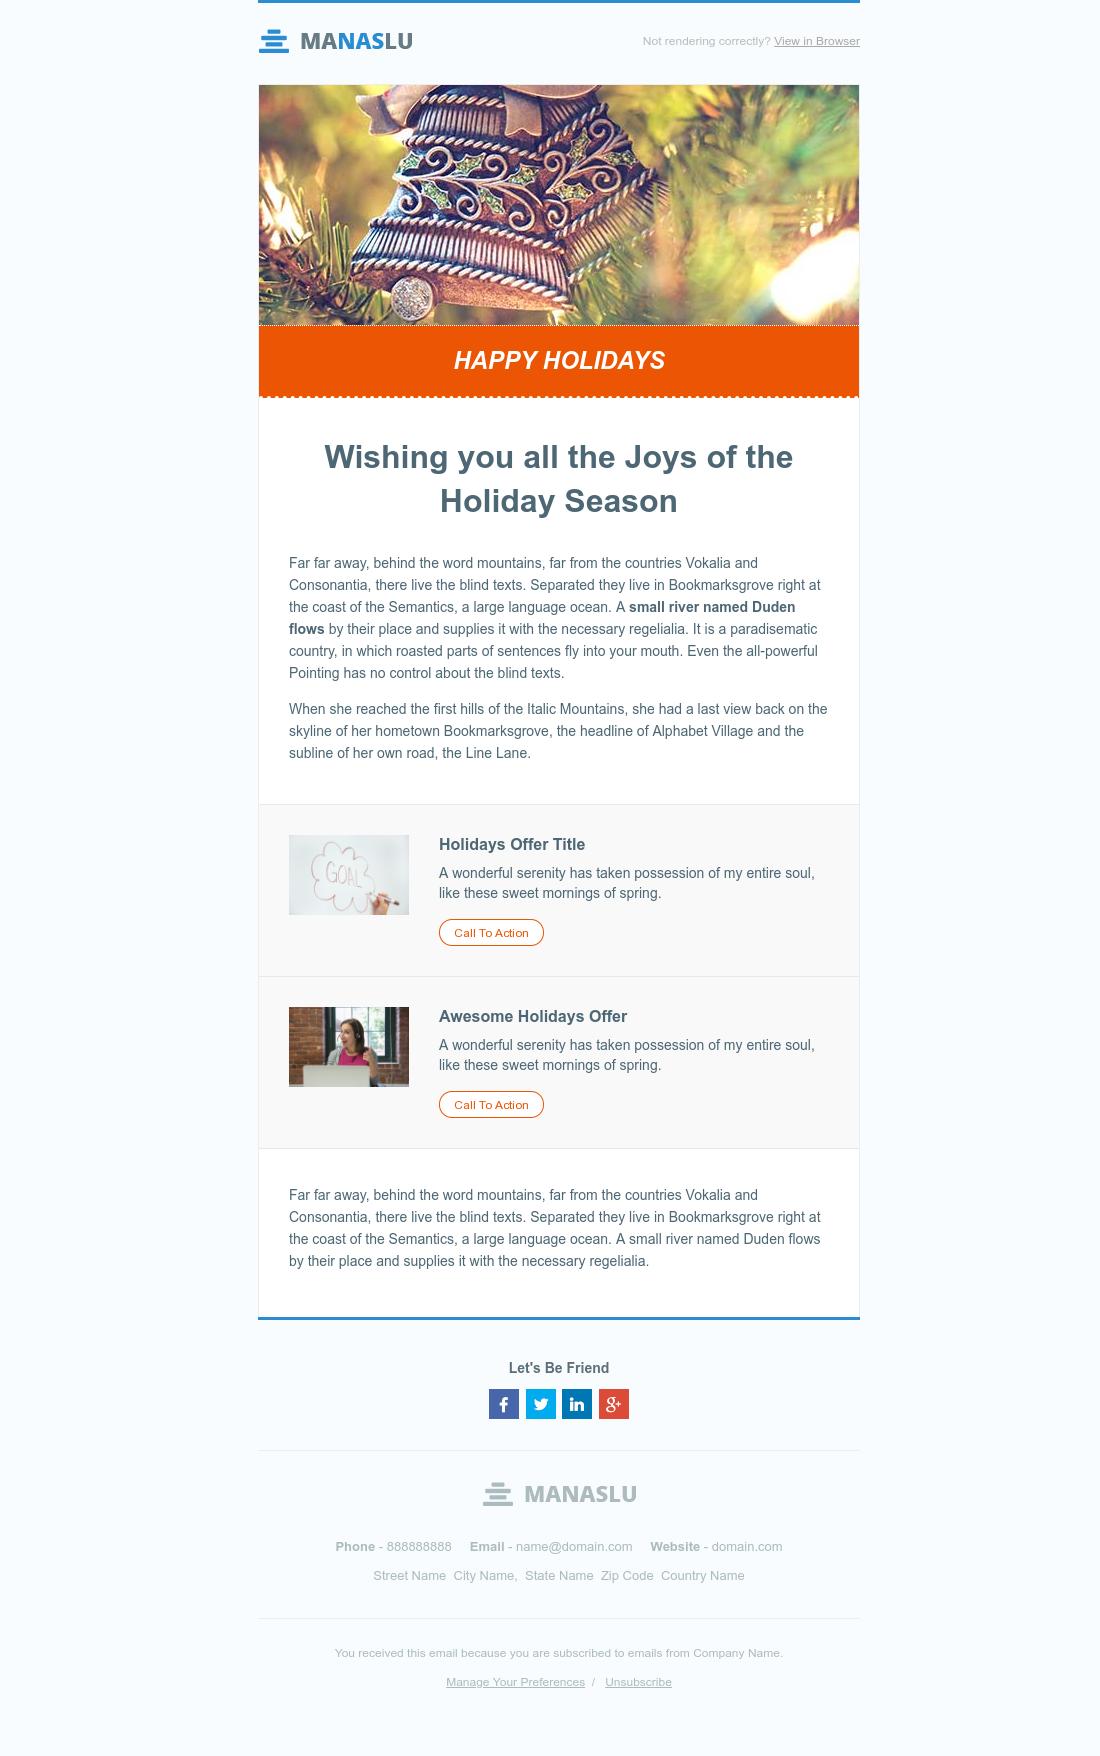 Manaslu Holidays Email Template V19 Hubspot